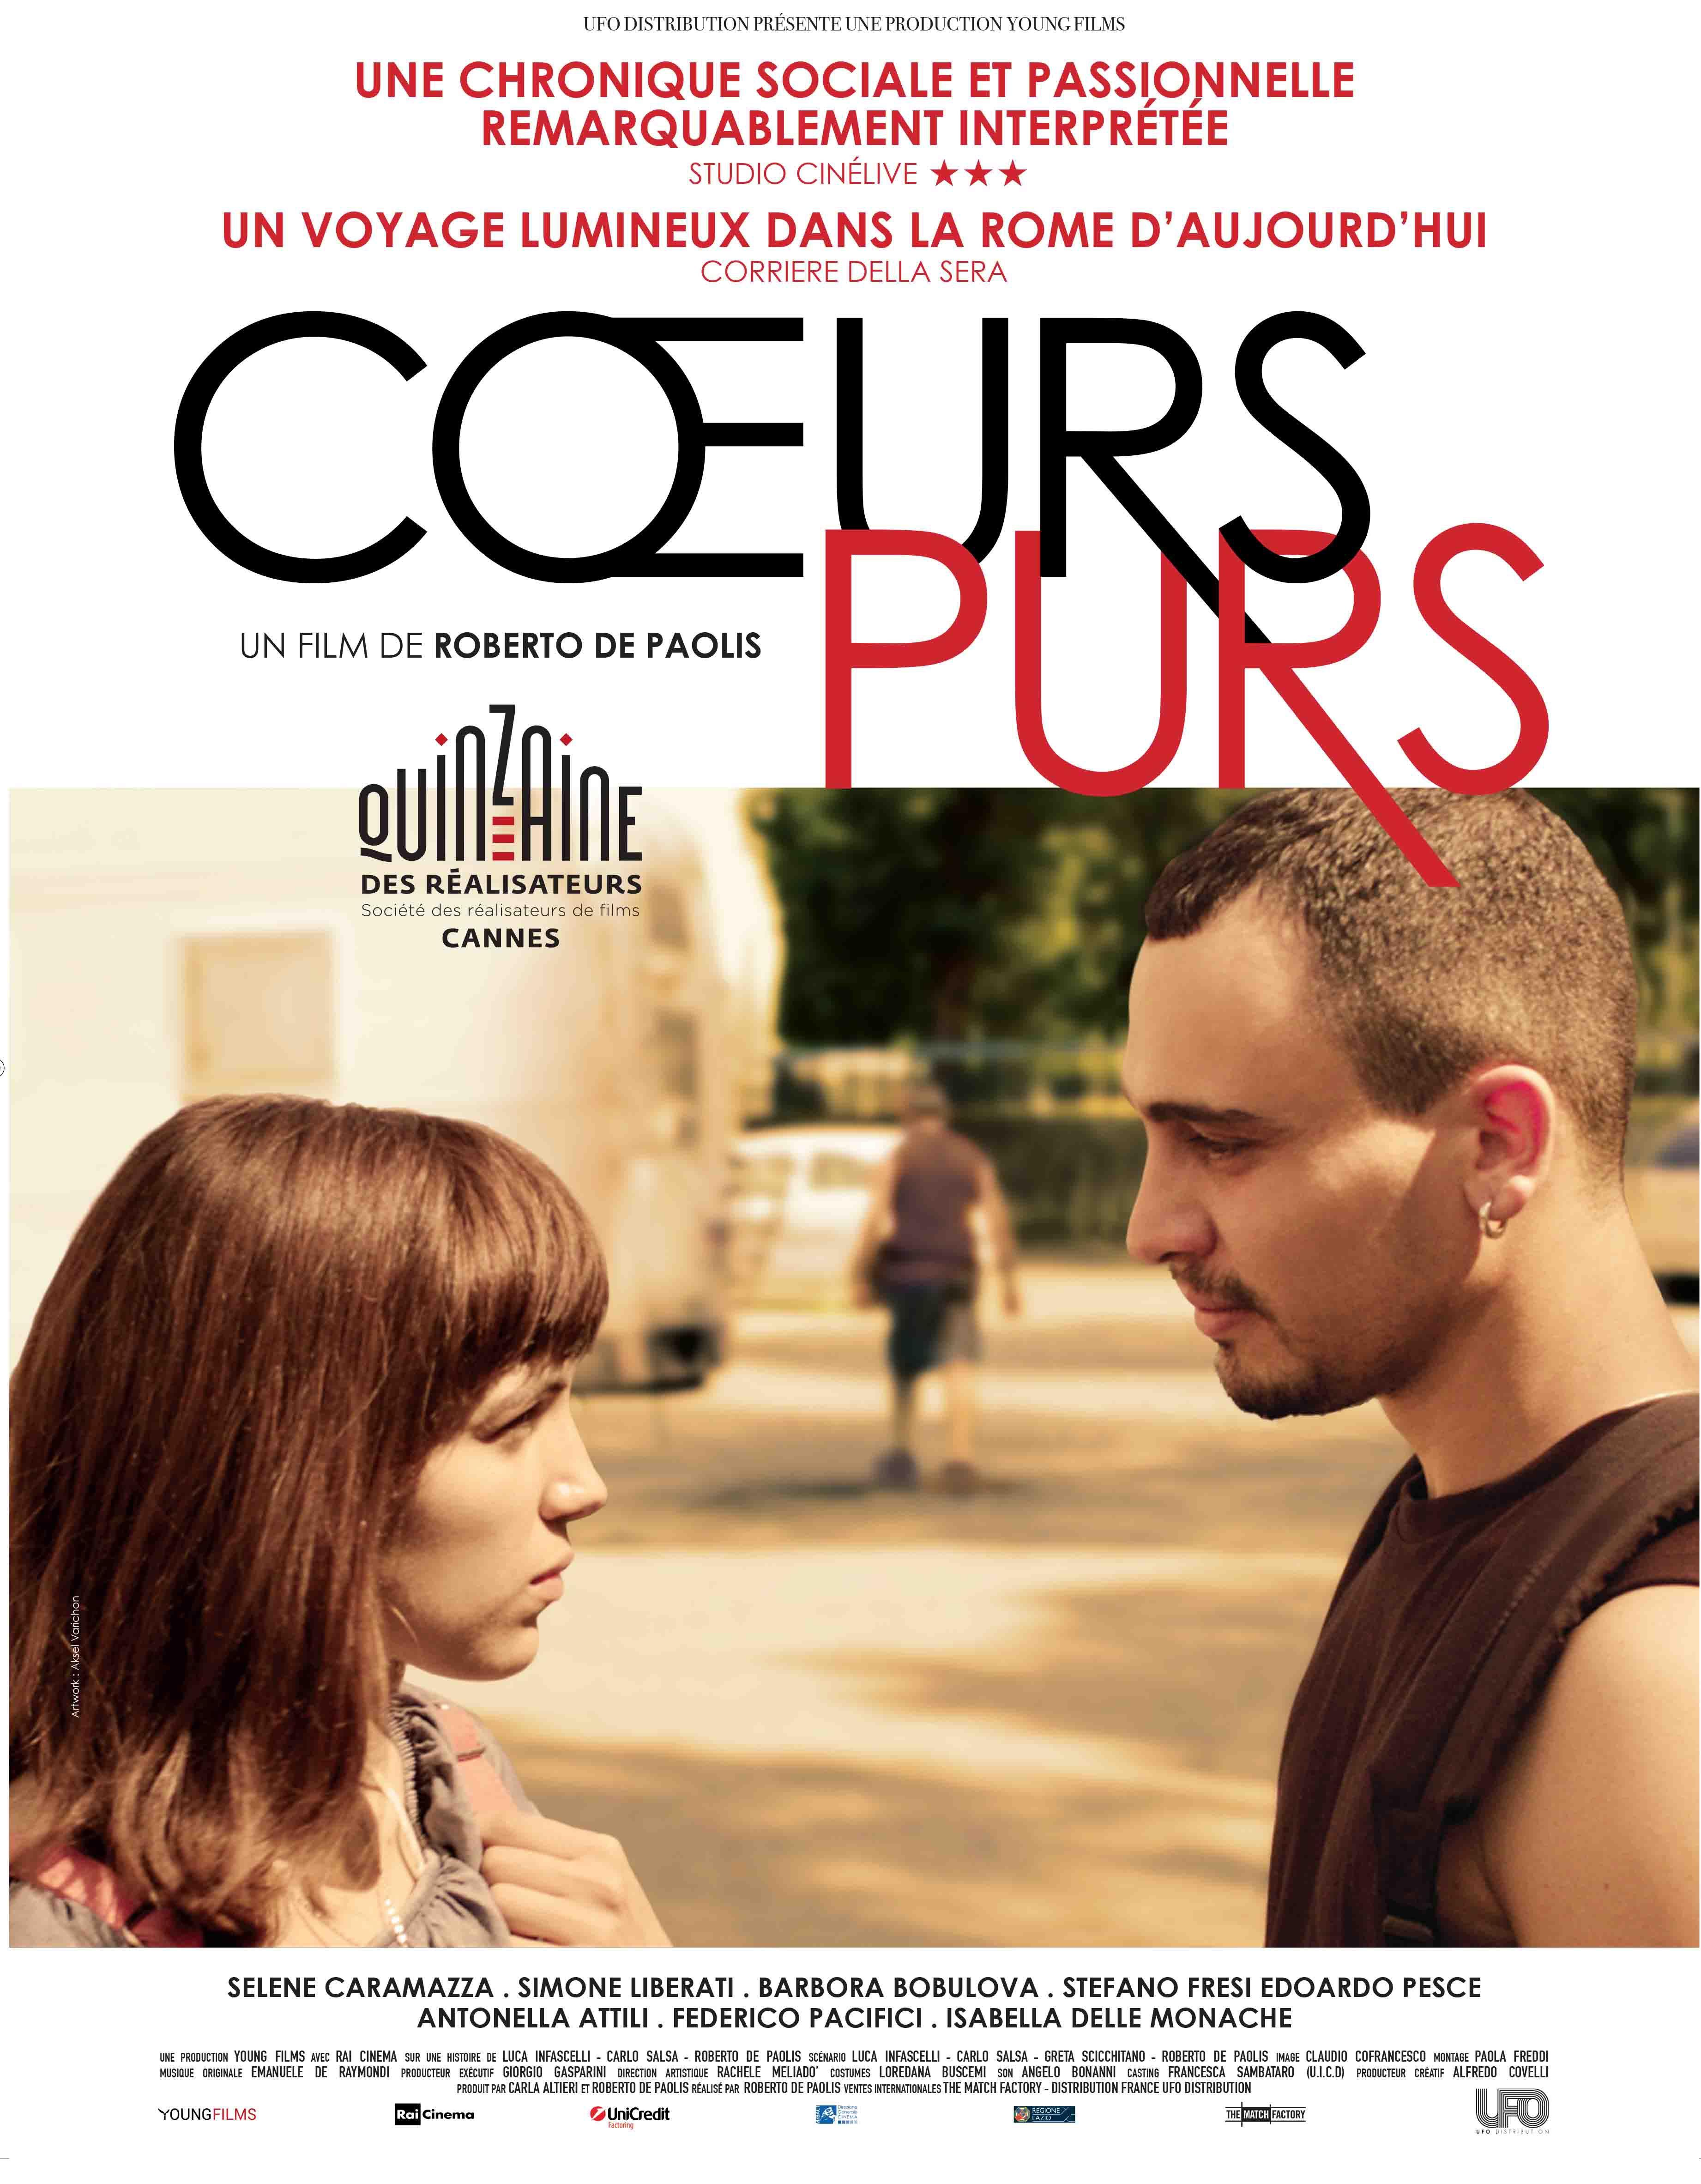 Coeurs purs - Film (2018)